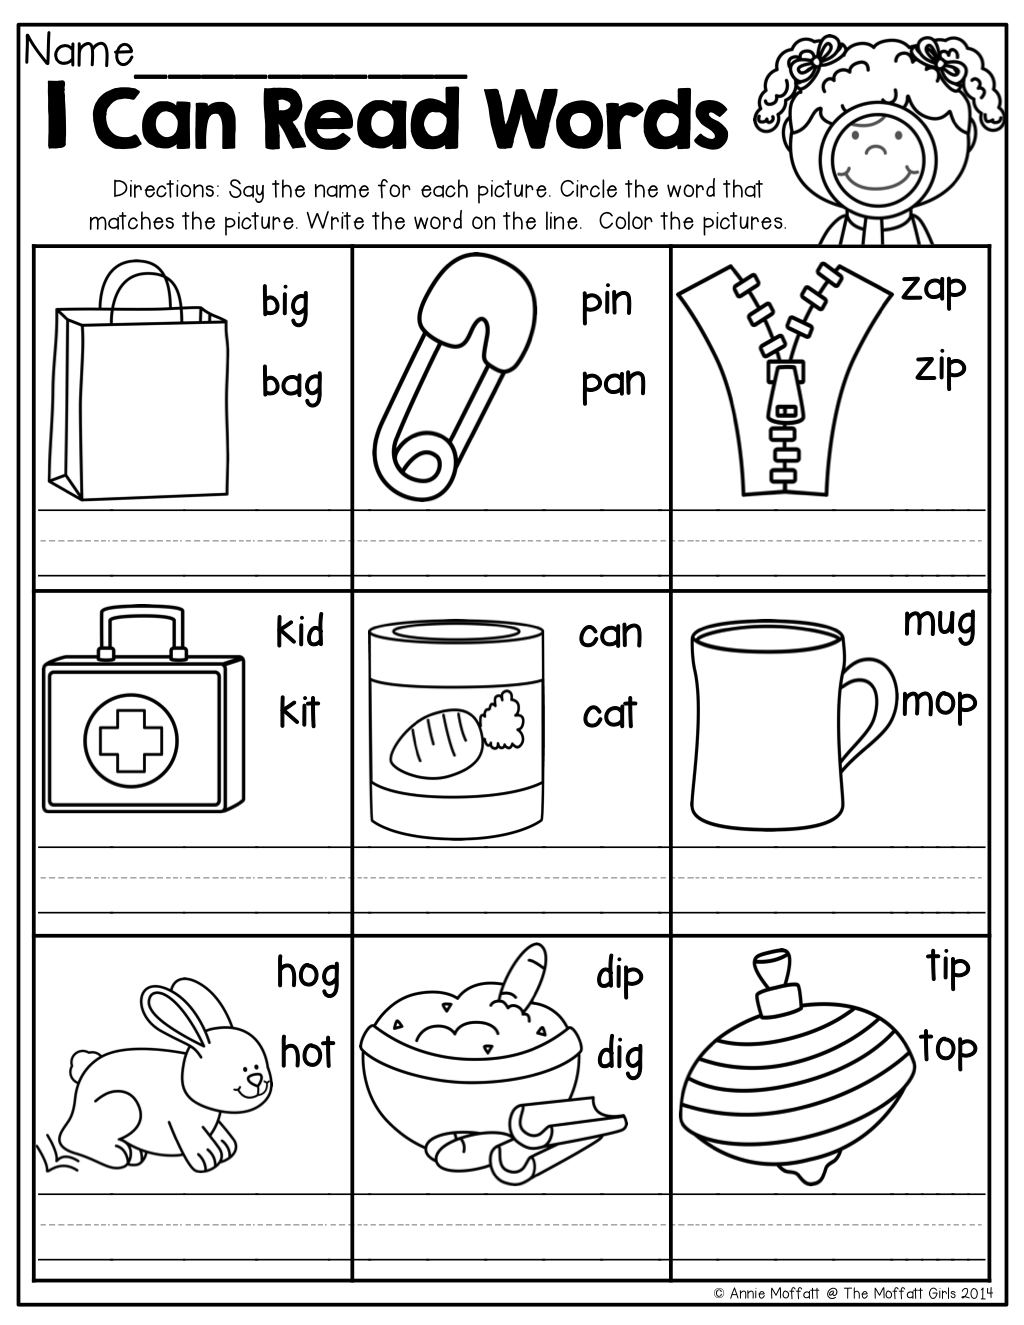 Cvc Worksheets For Kindergarten For Free Download - Math Worksheet - Free Printable Cvc Worksheets